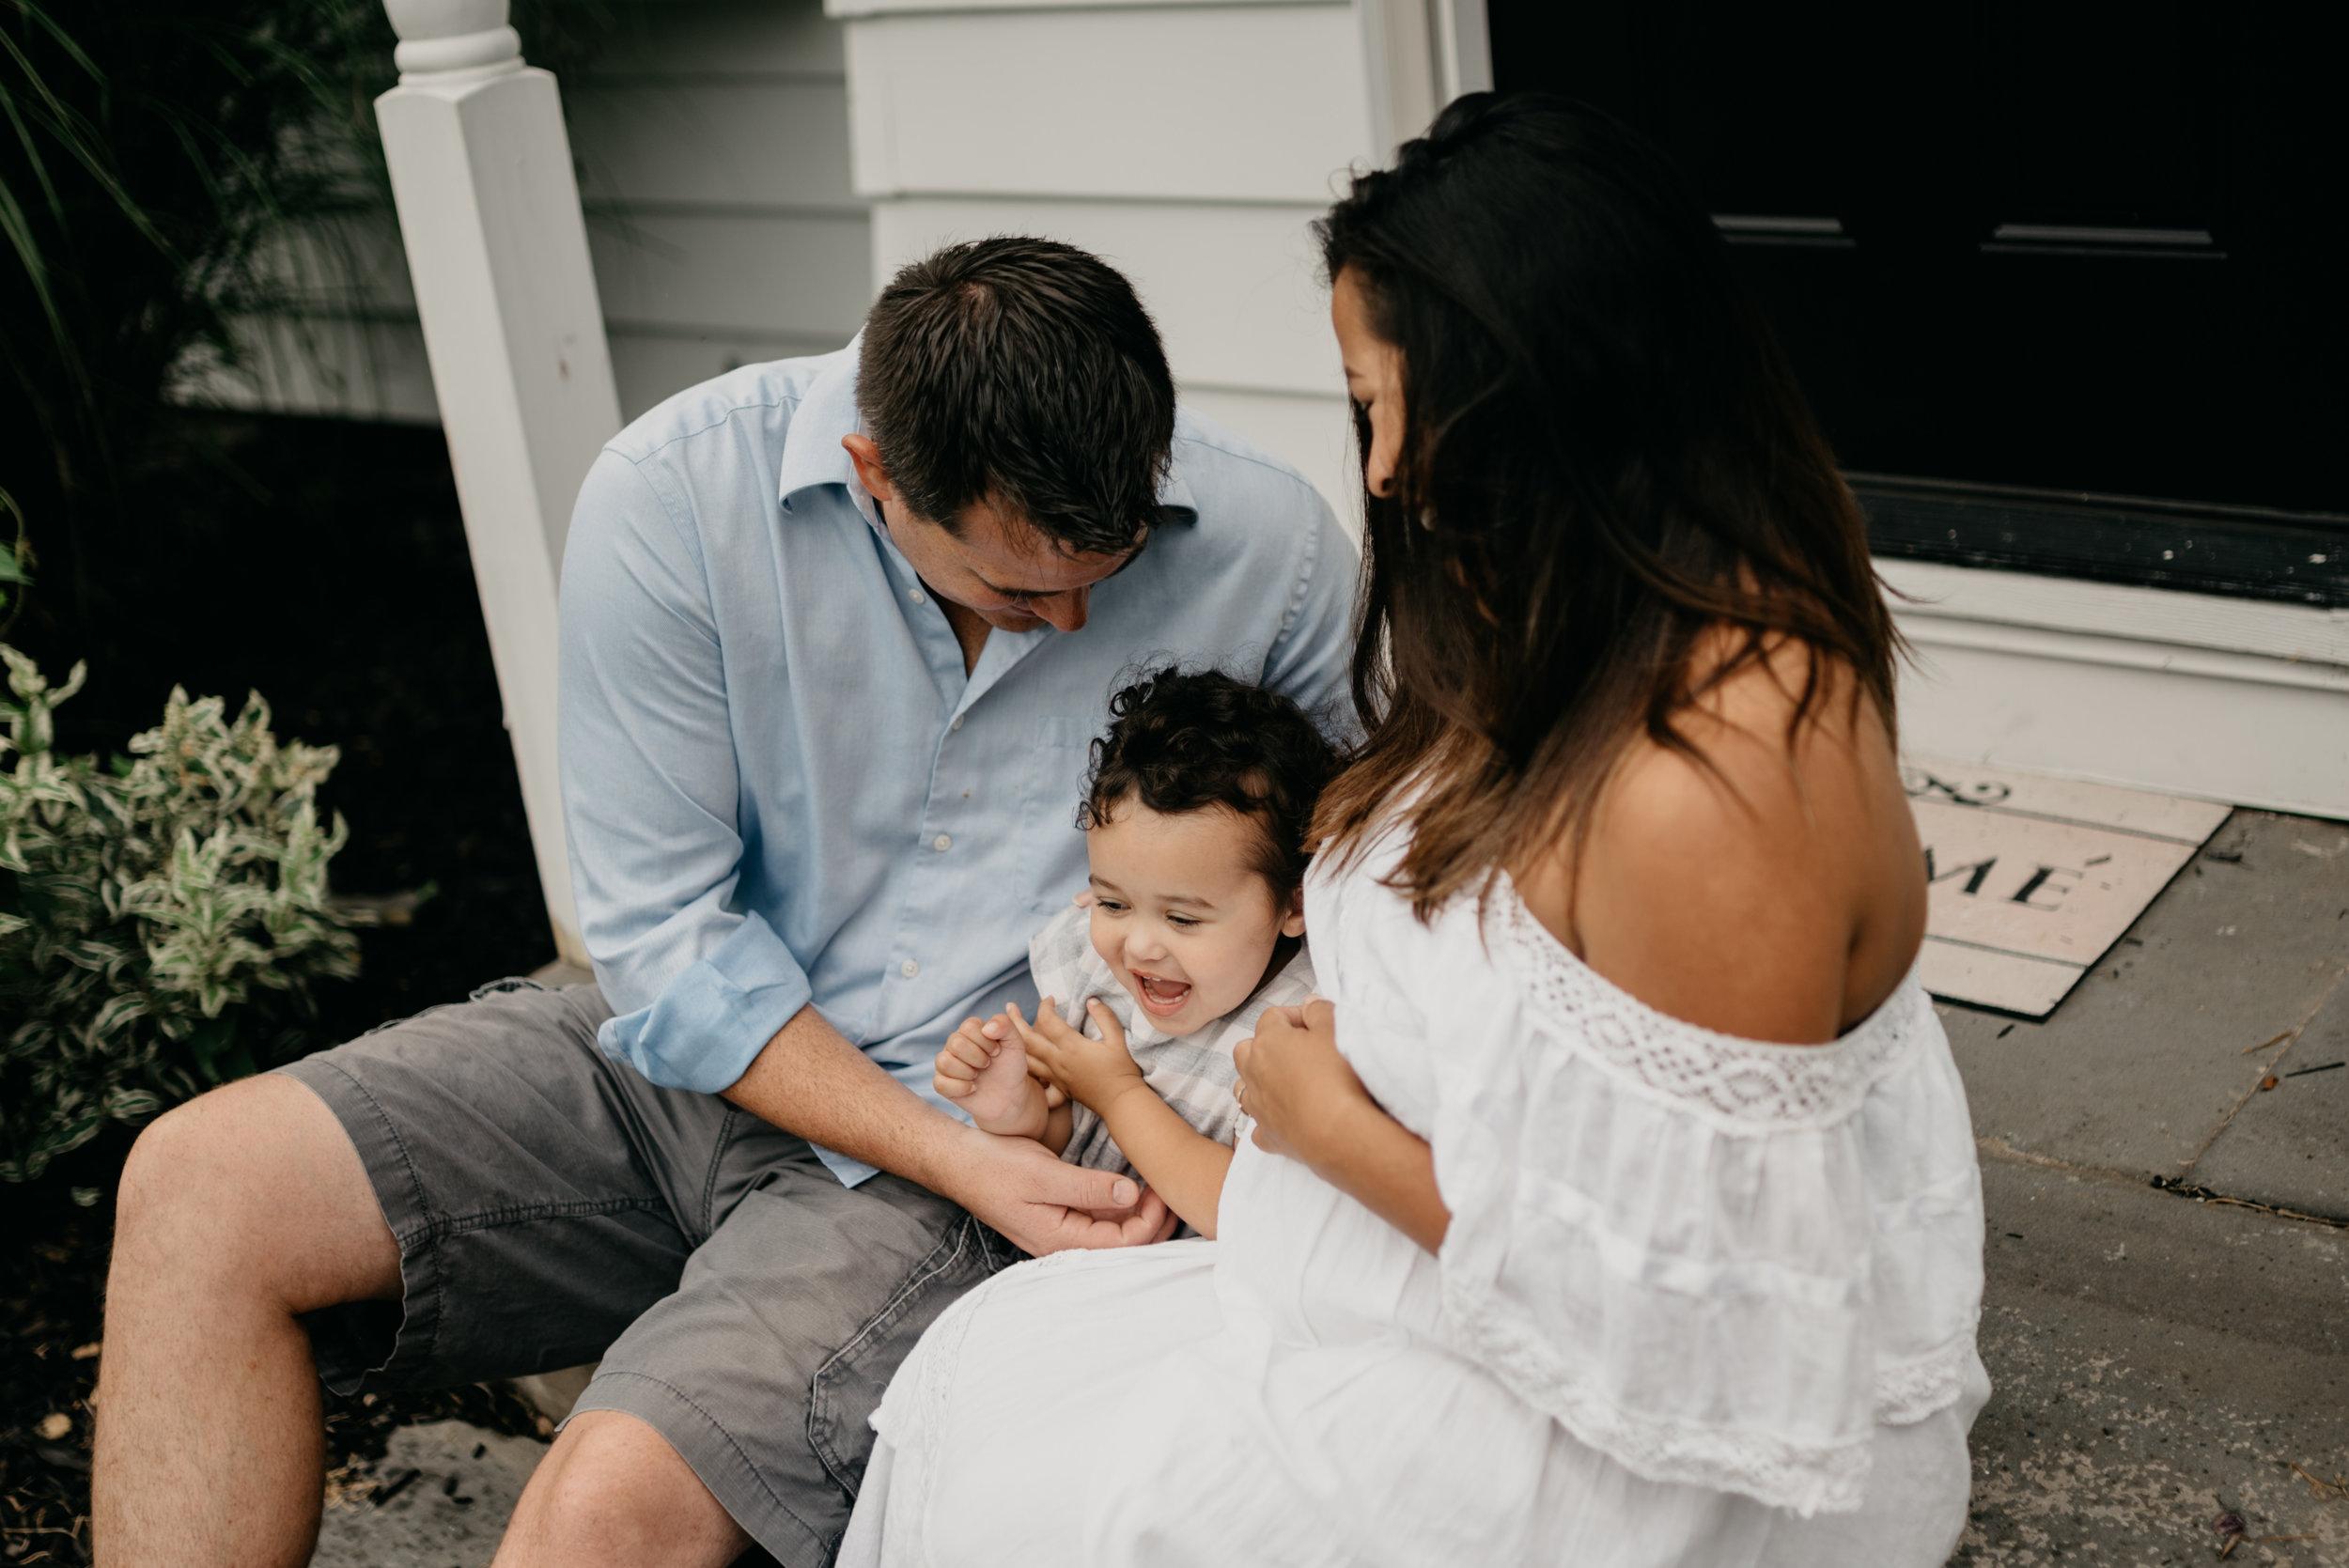 Ehrman-Massachusetts-In Home Lifestyle Maternity Session-Documentary Family Photographer-436.jpg